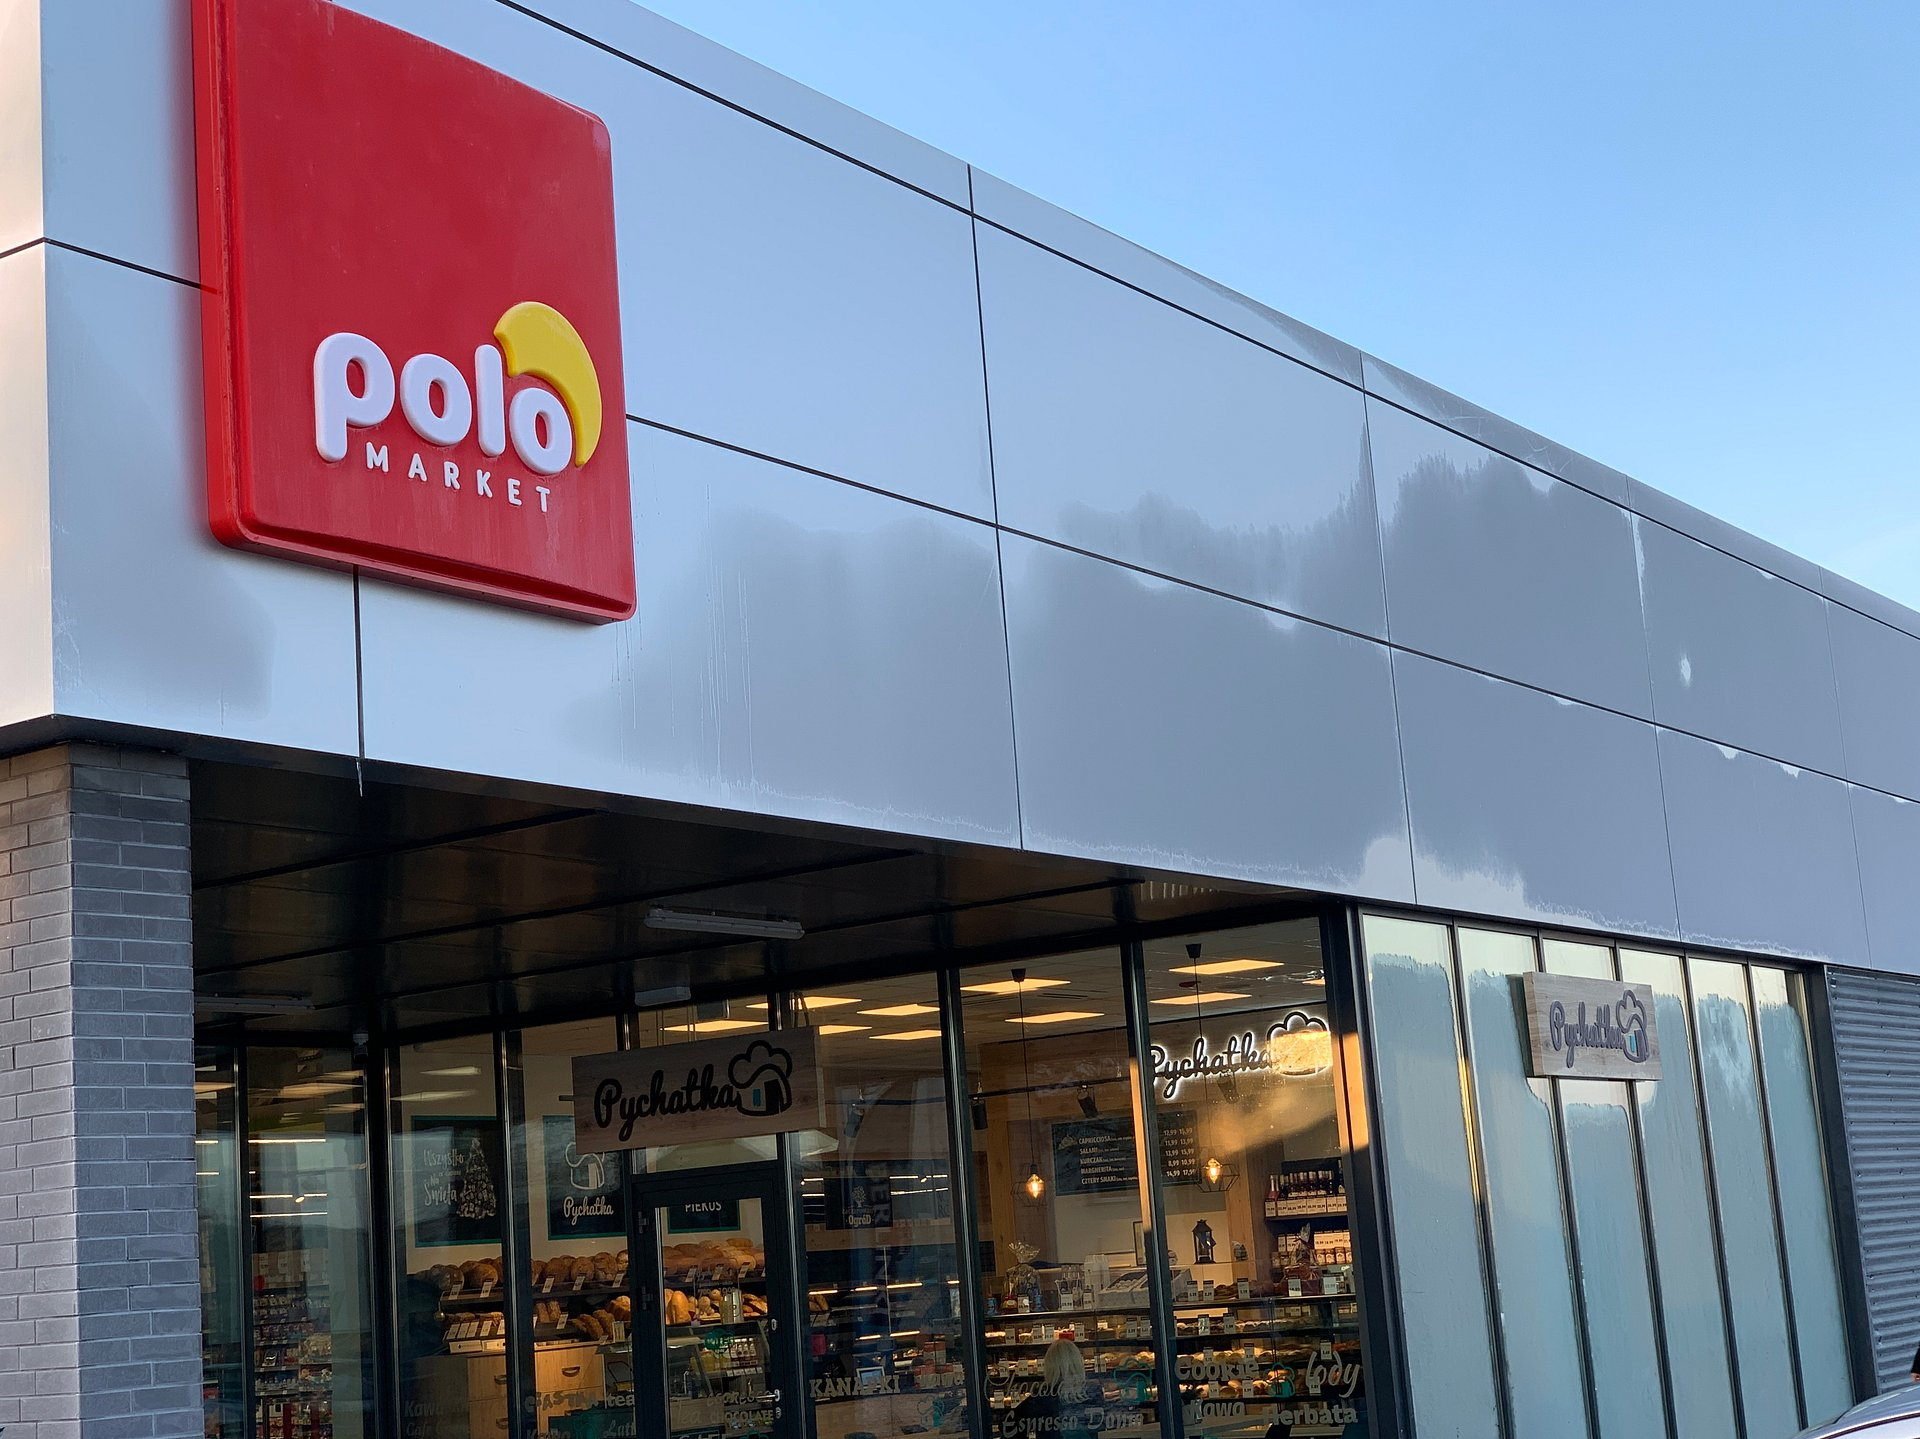 Kolejny nowy supermarket Grupy POLOmarket